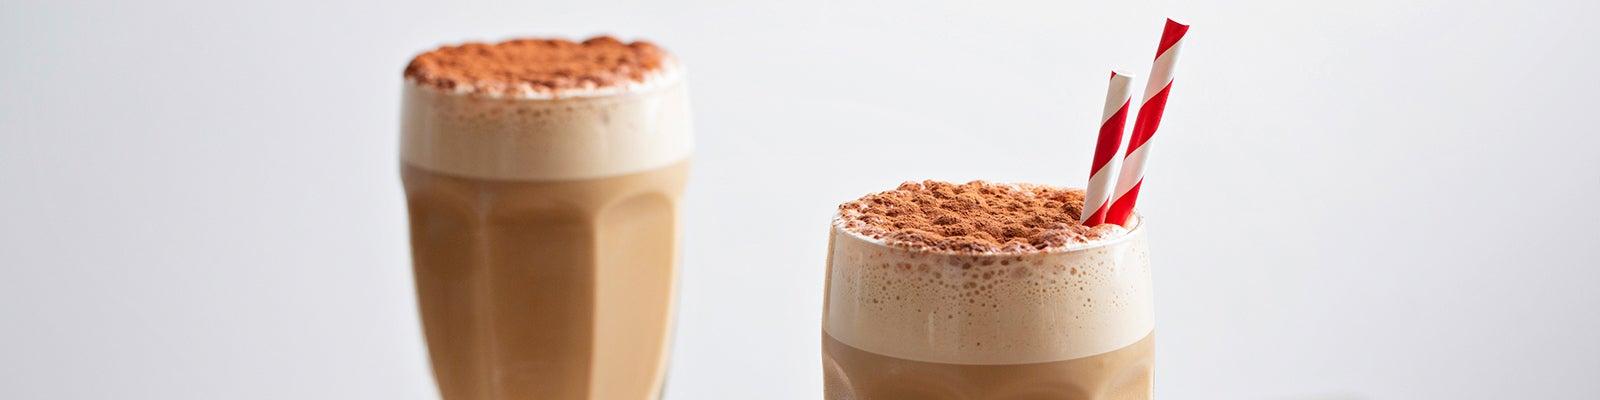 cappuccino-milkshake-recipe-header-desktop_0_tablet